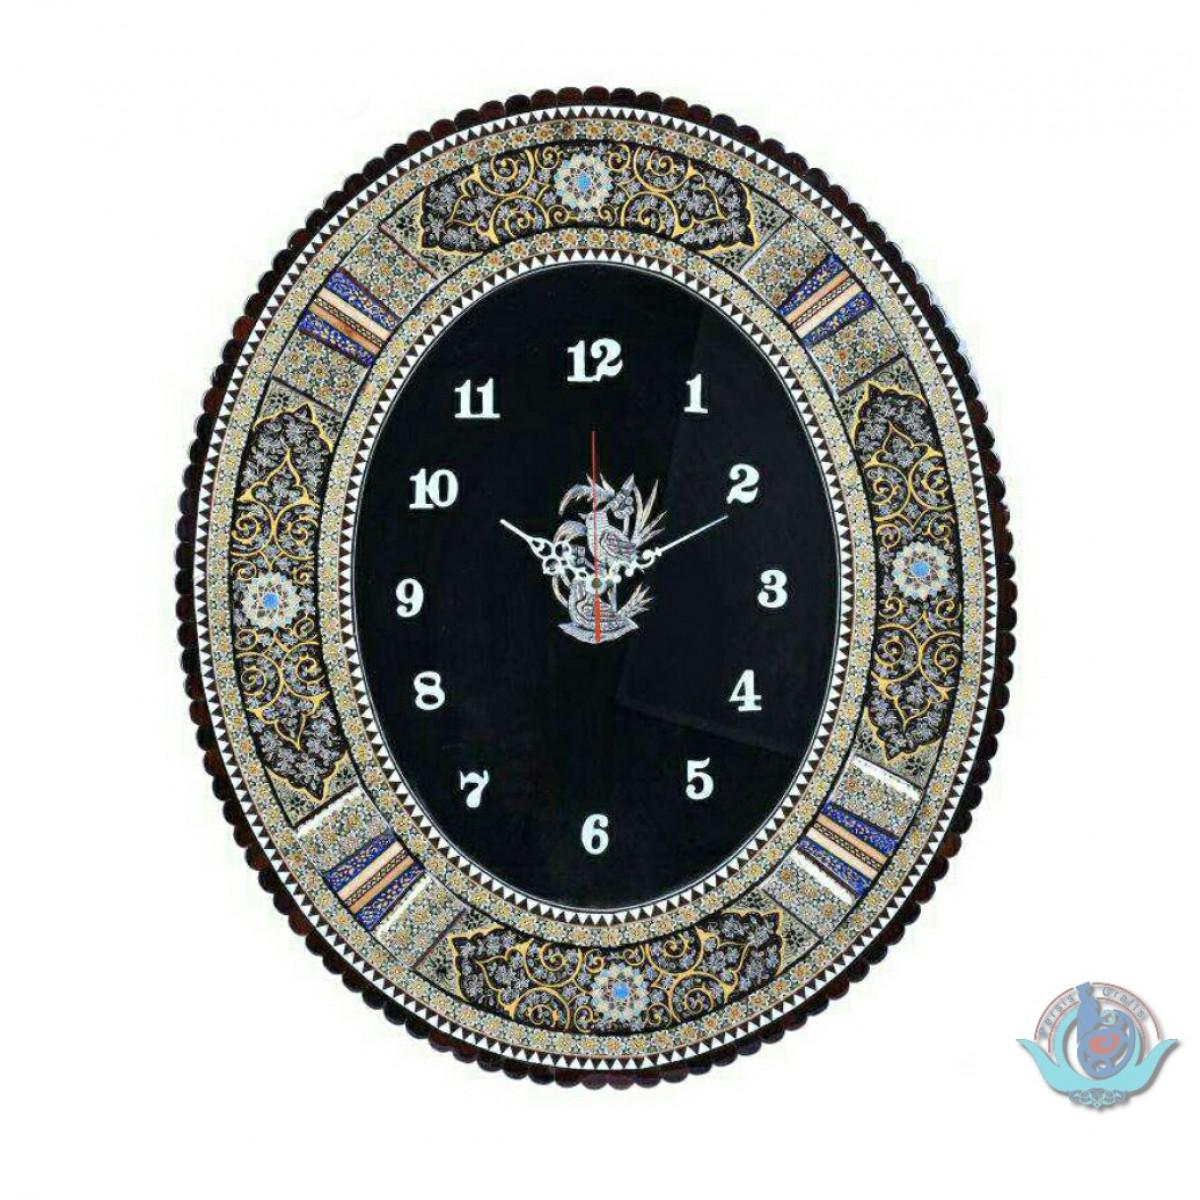 Khatam Marquetry Wall Clock - PKH1029-Persian Handicrafts